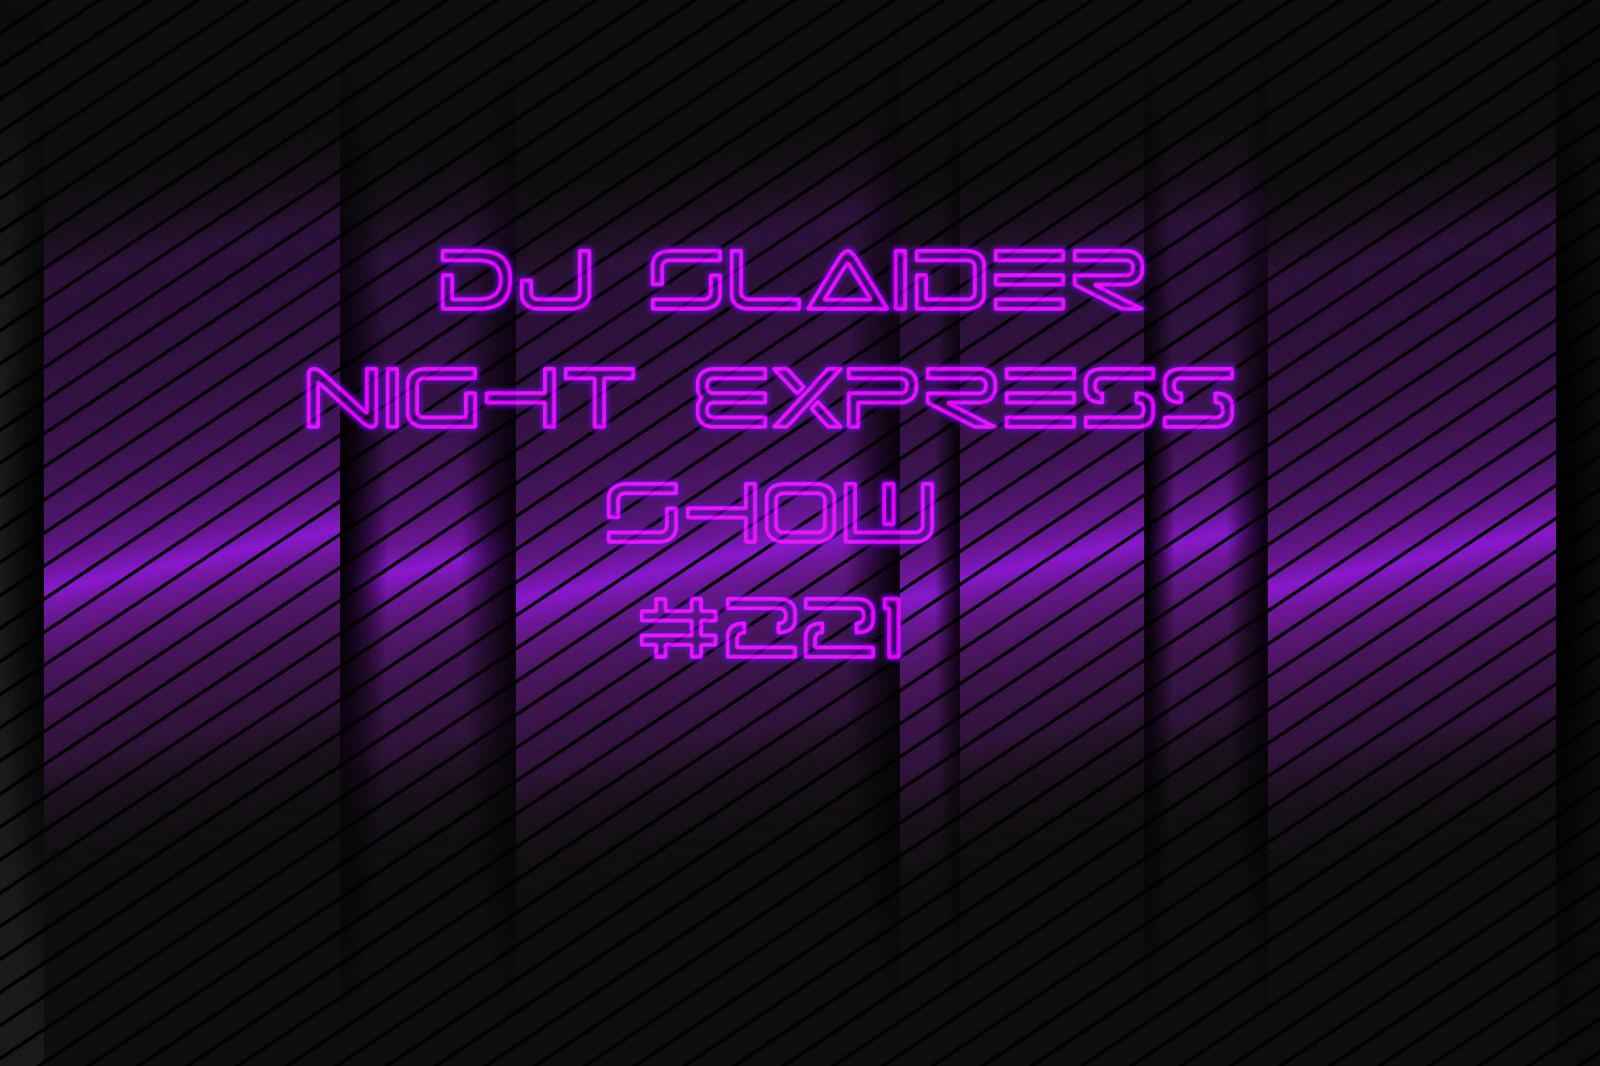 DJ Slaider — Night Express Show #221